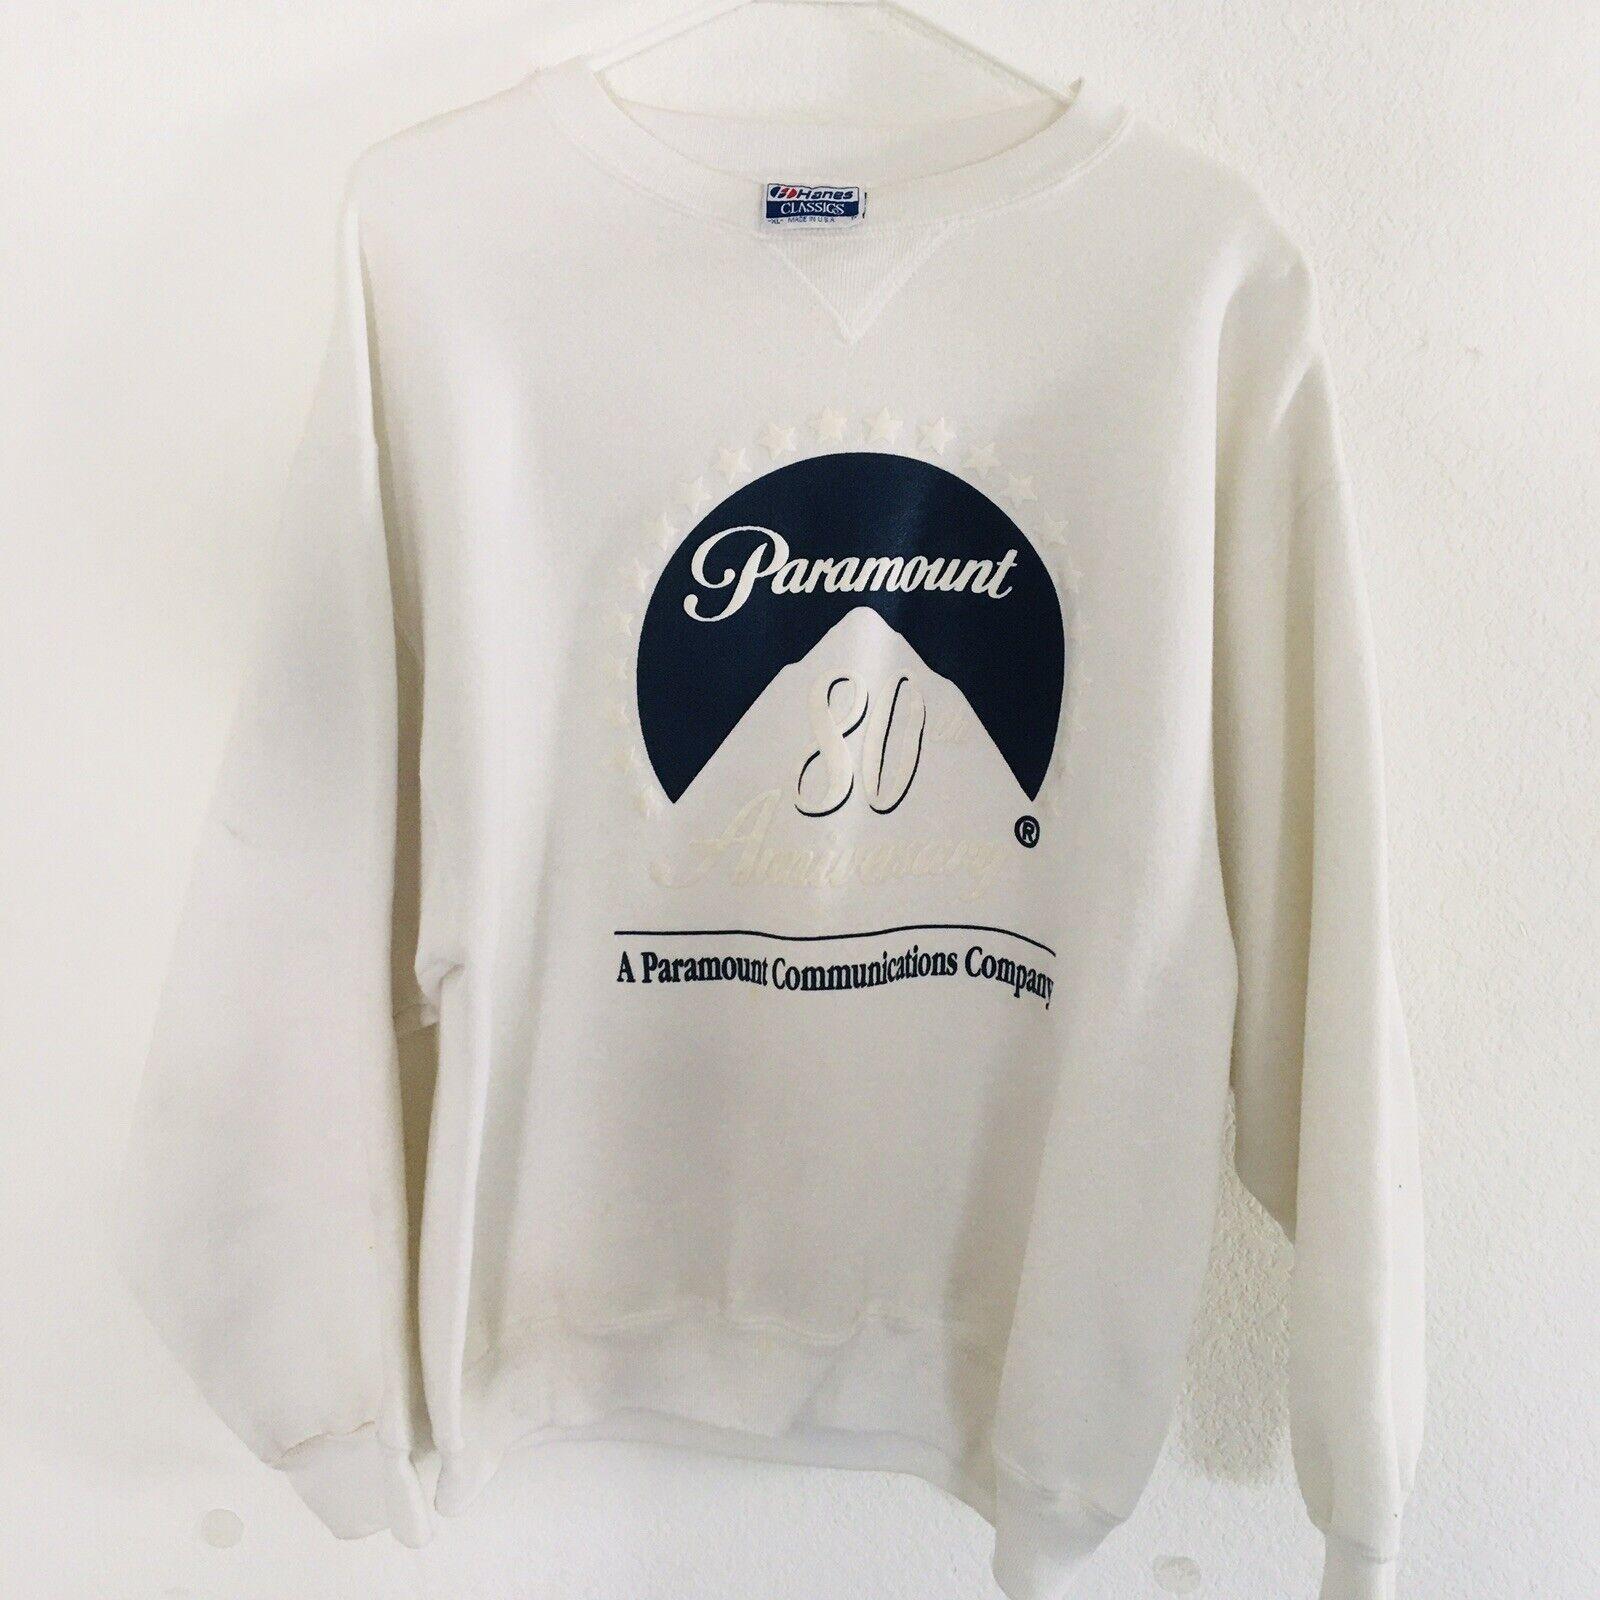 Paramount 80th Anniversary Sweatshirt Sweater 1992 Tag Hanes Classics XL USA 90s